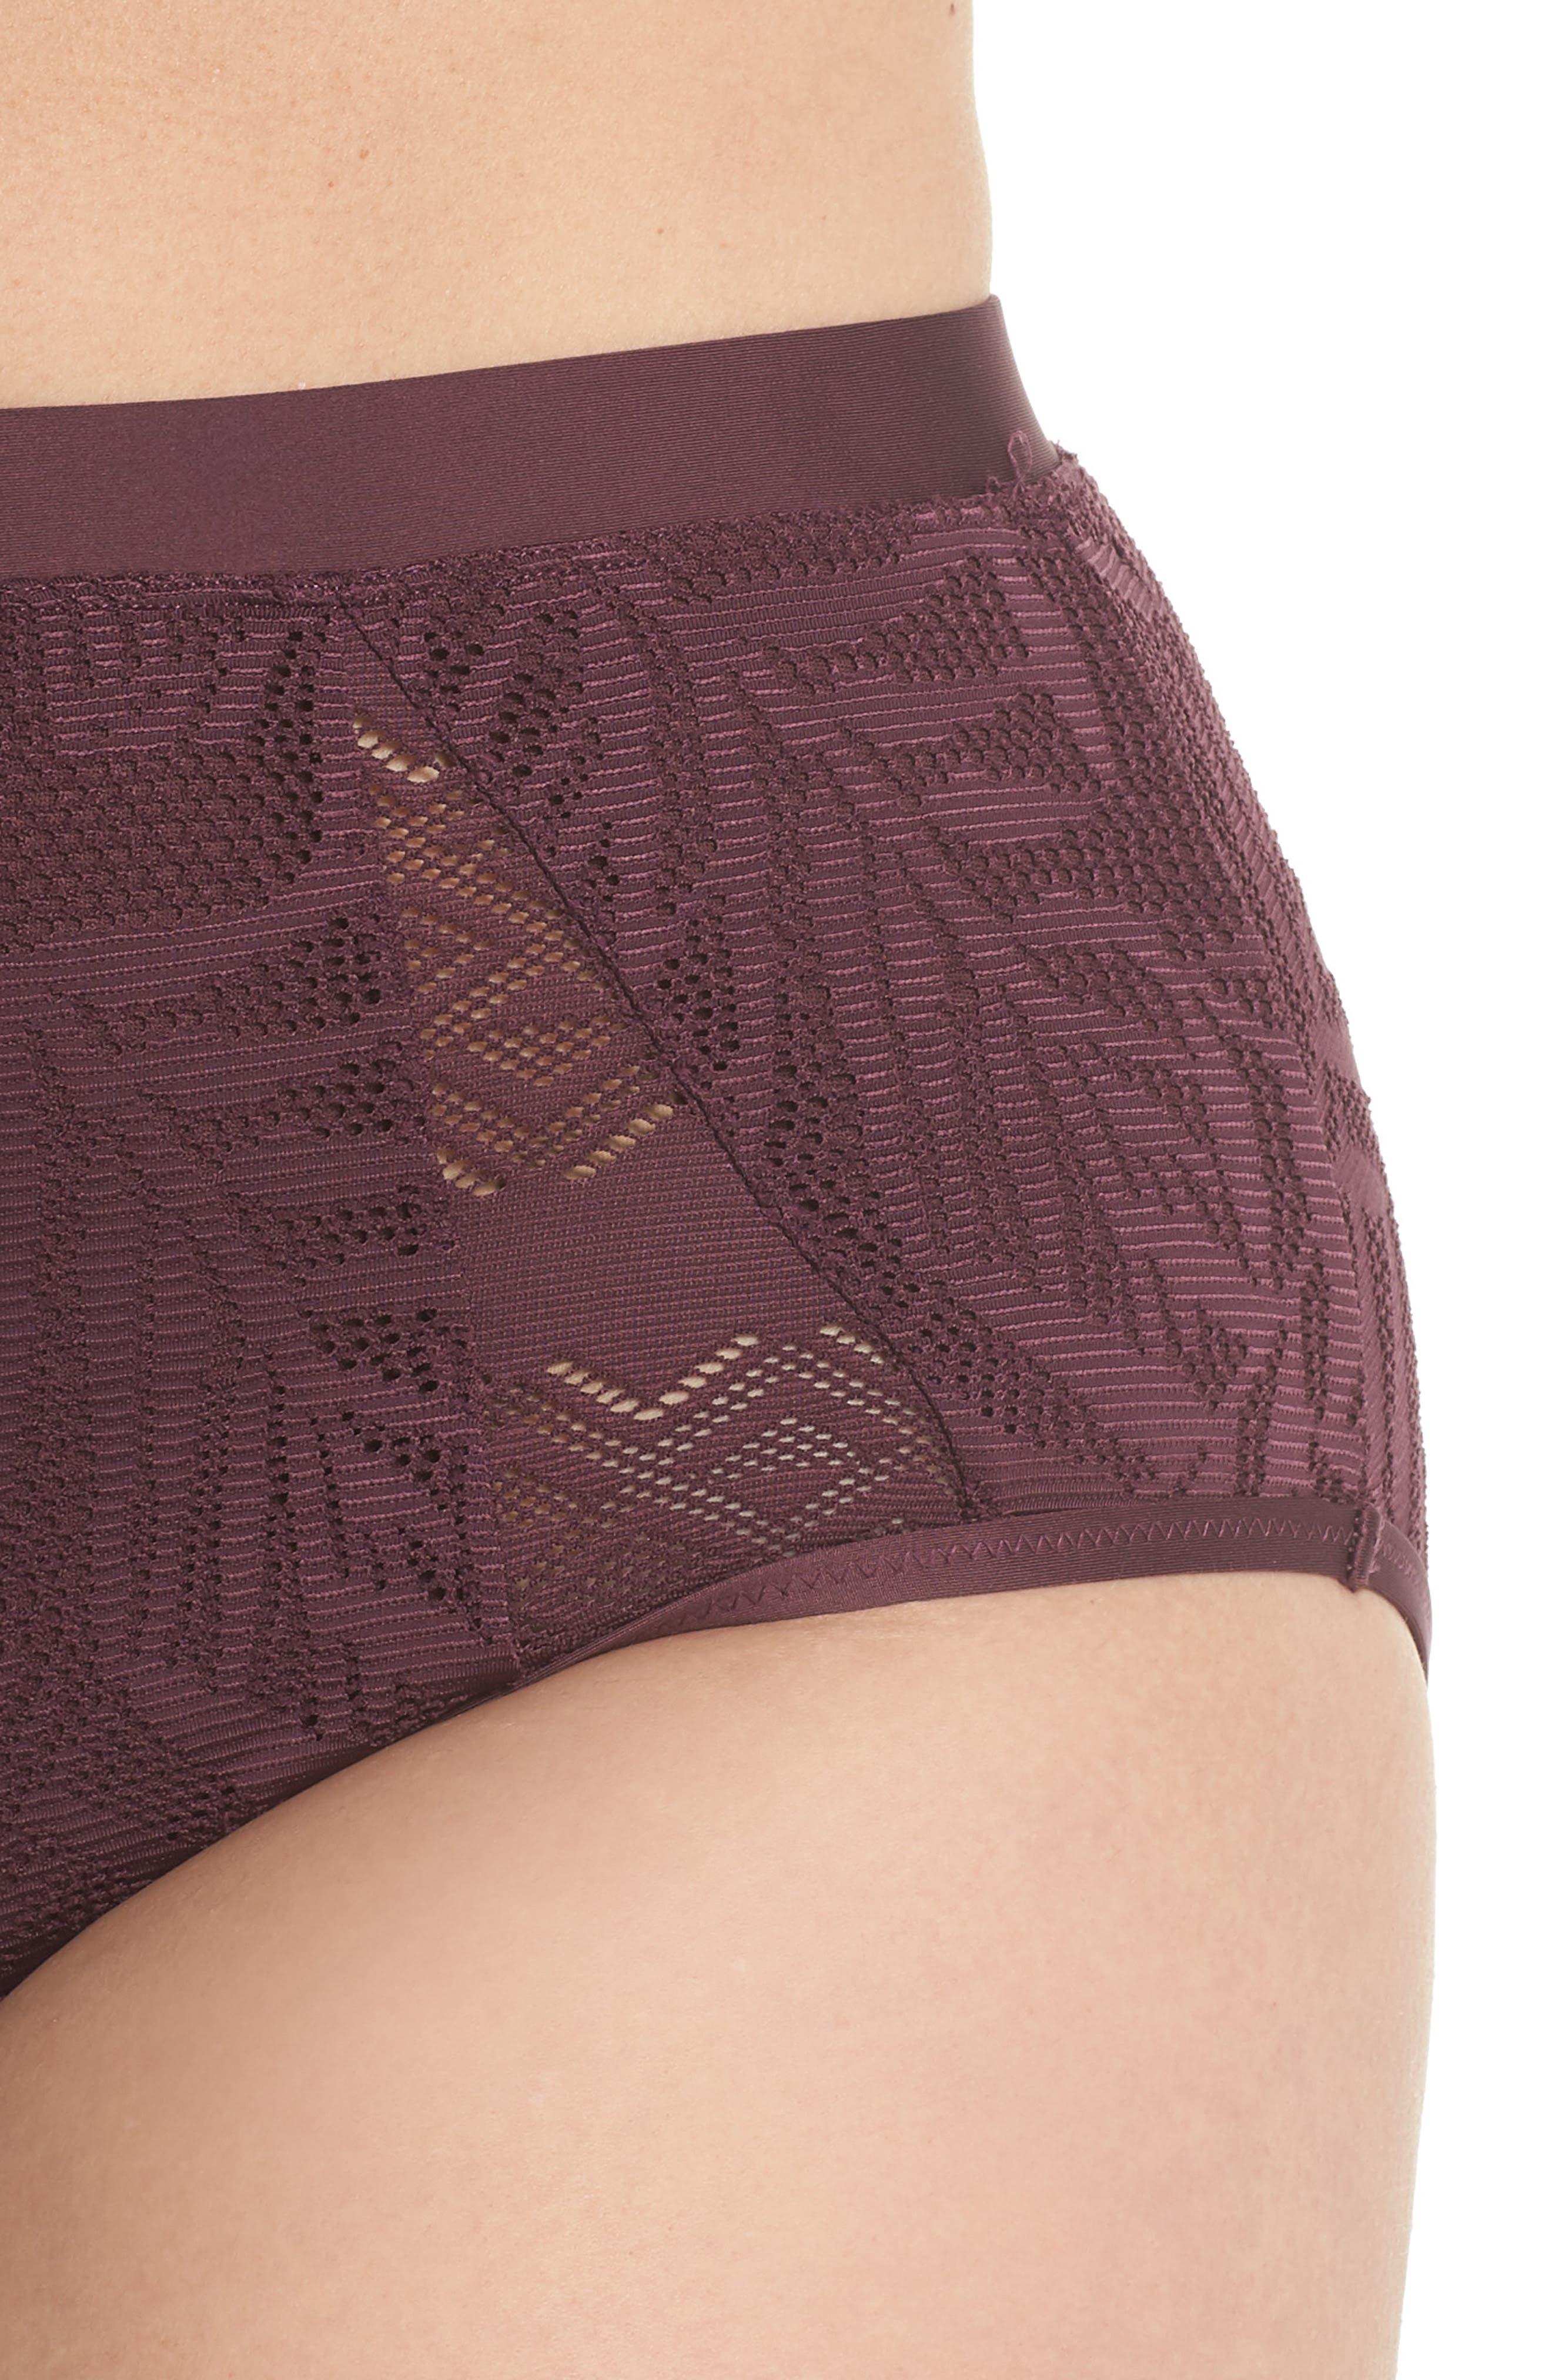 Crochet Inset High Waist Bikini Bottoms,                             Alternate thumbnail 4, color,                             Wine